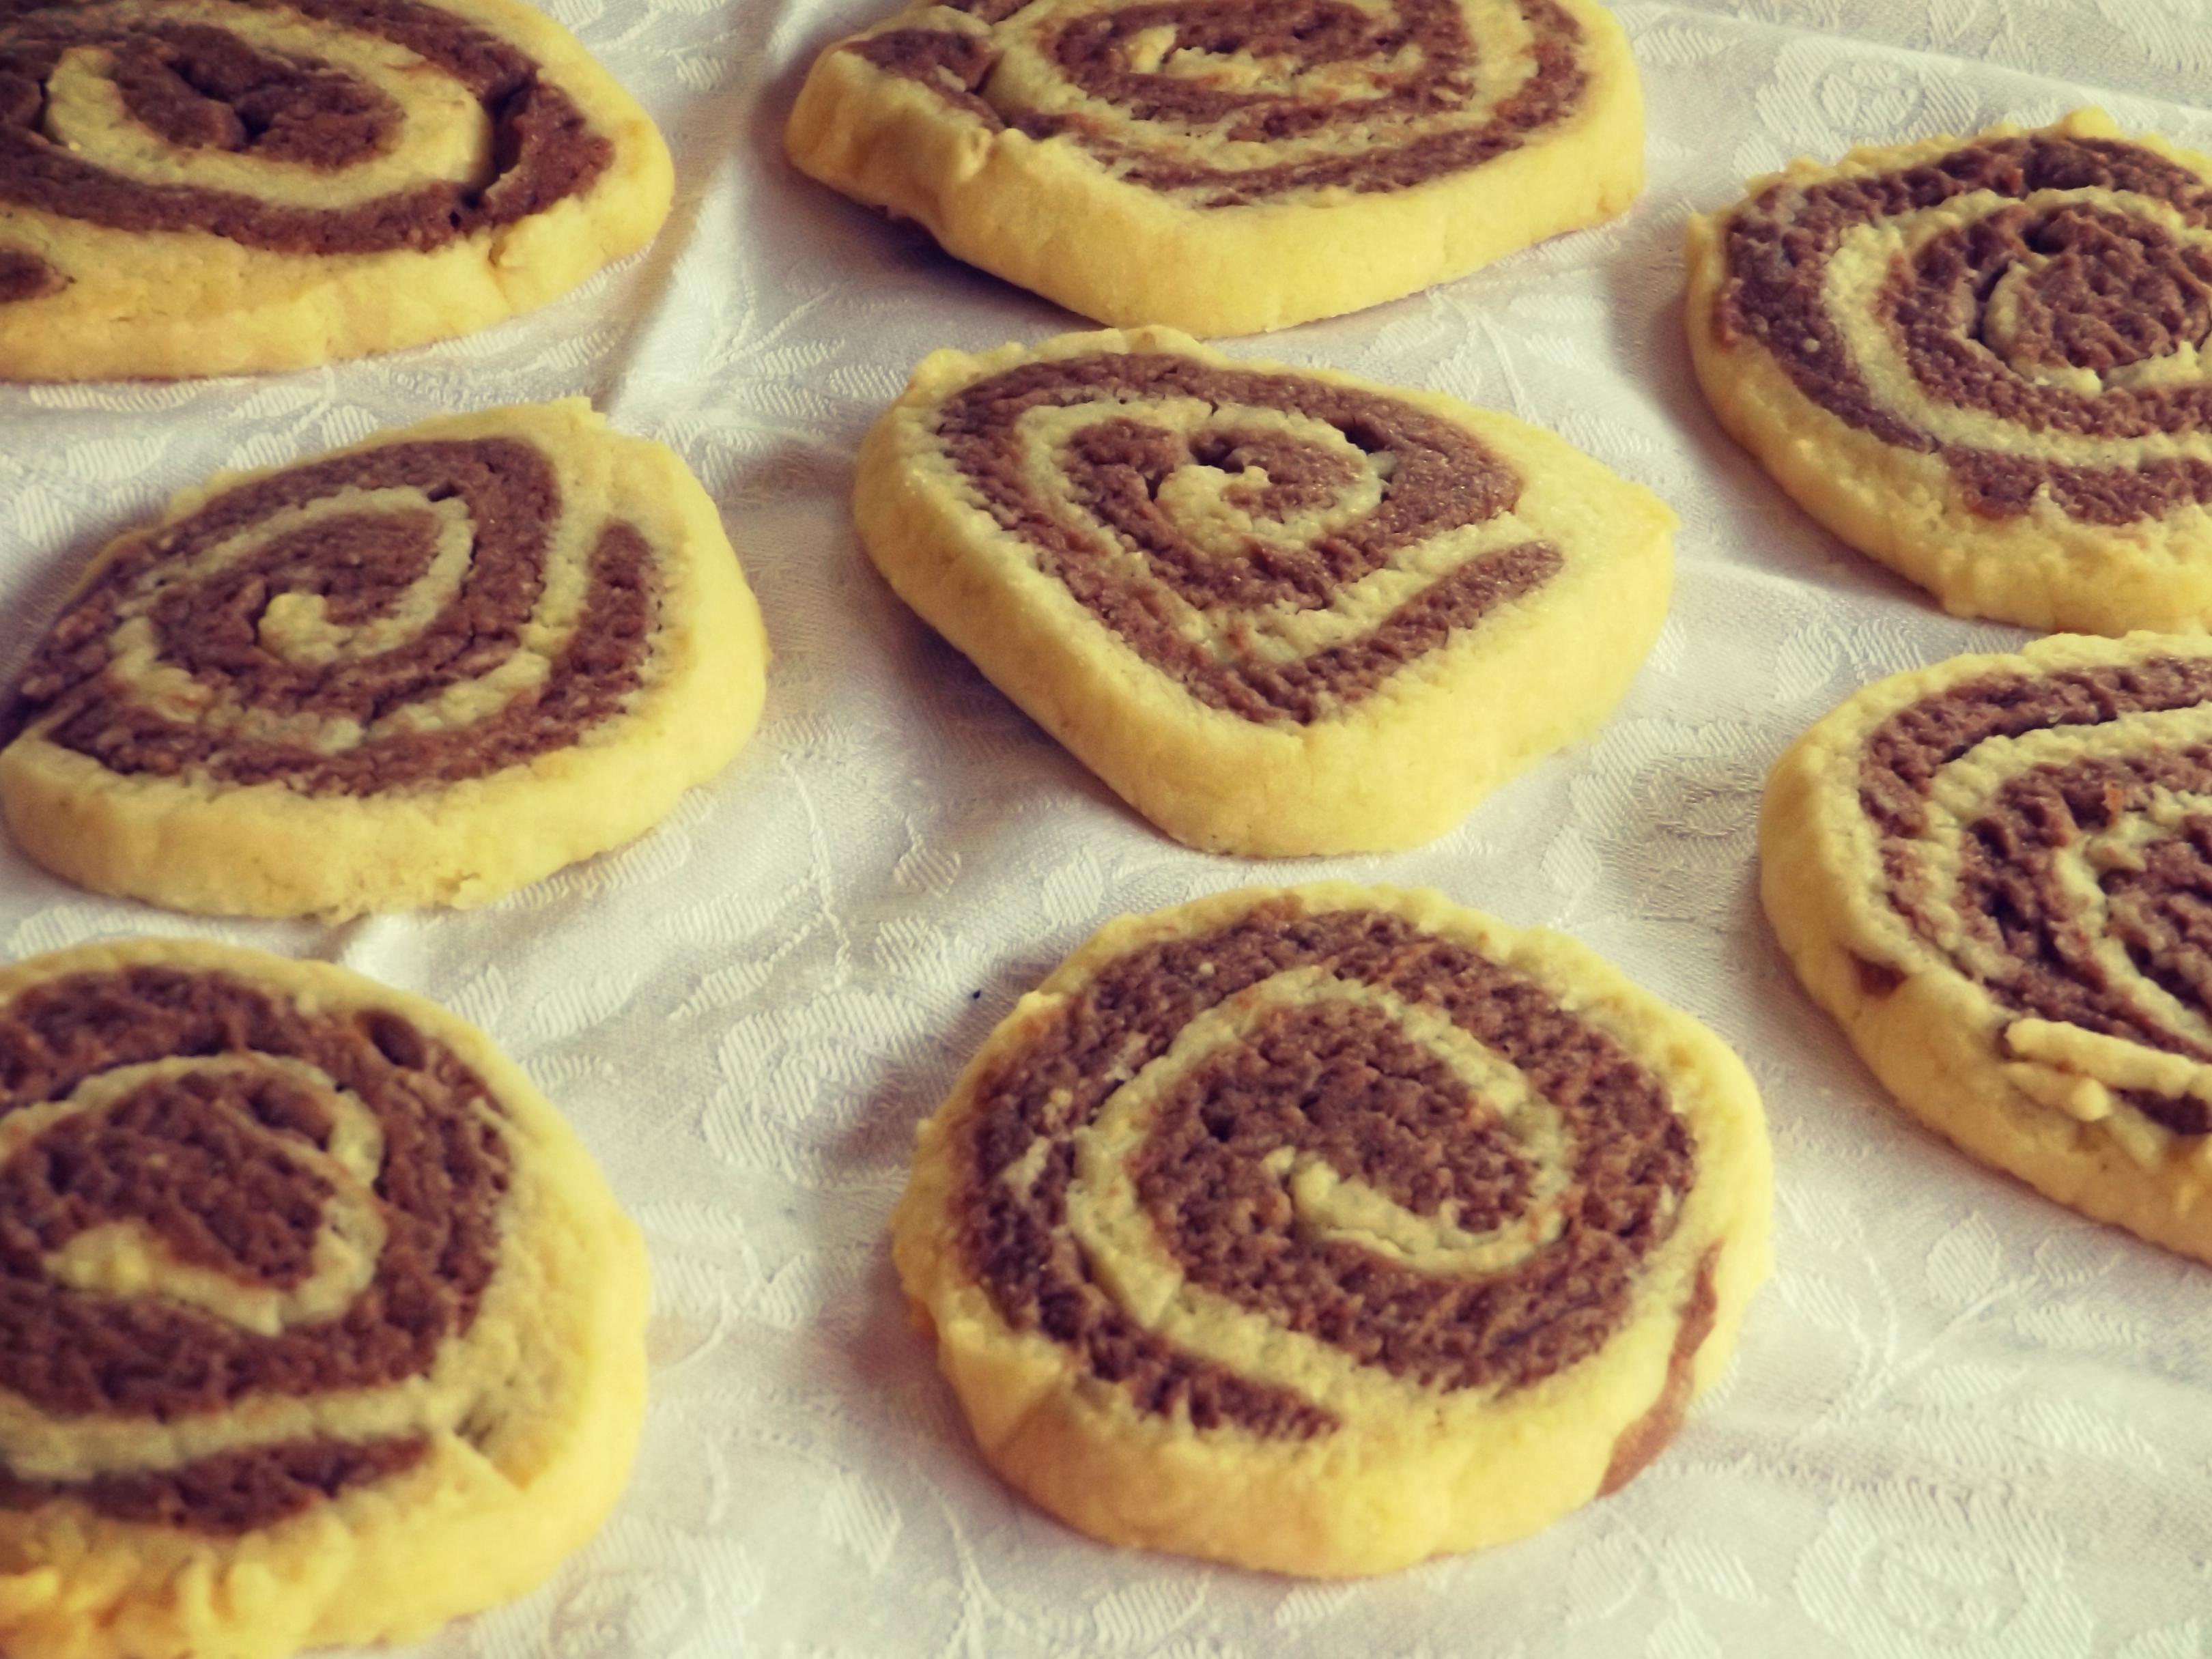 Two-tone shortbread cookies